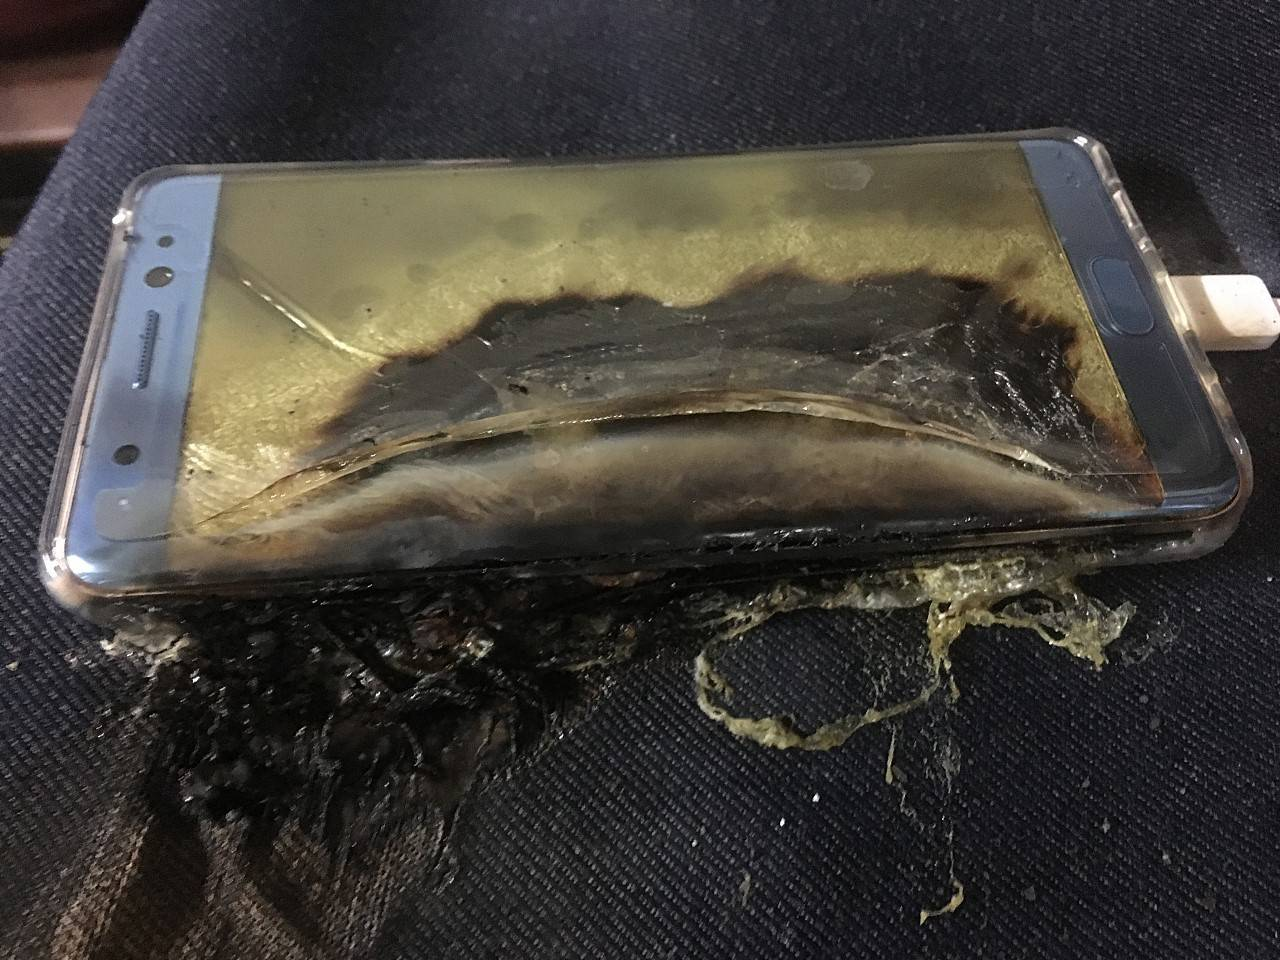 explosivestartforsamsunggalaxynote7morephonescatchfirewhilecharging5077934-5c4c243a33bf47457981a8dd5b011fa2.jpg